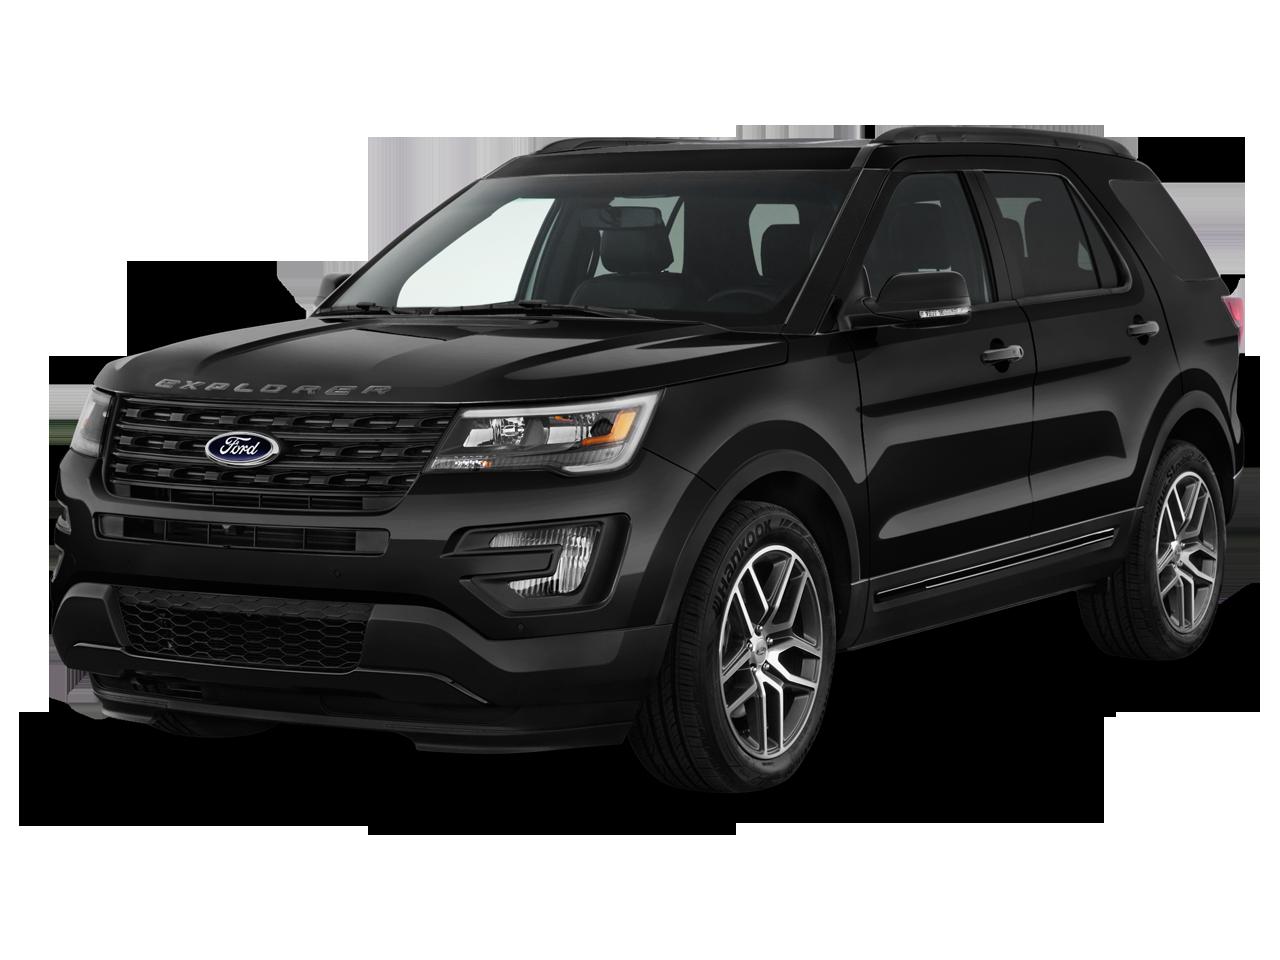 New 2017 Ford Explorer Spor Near Jonesboro Ar